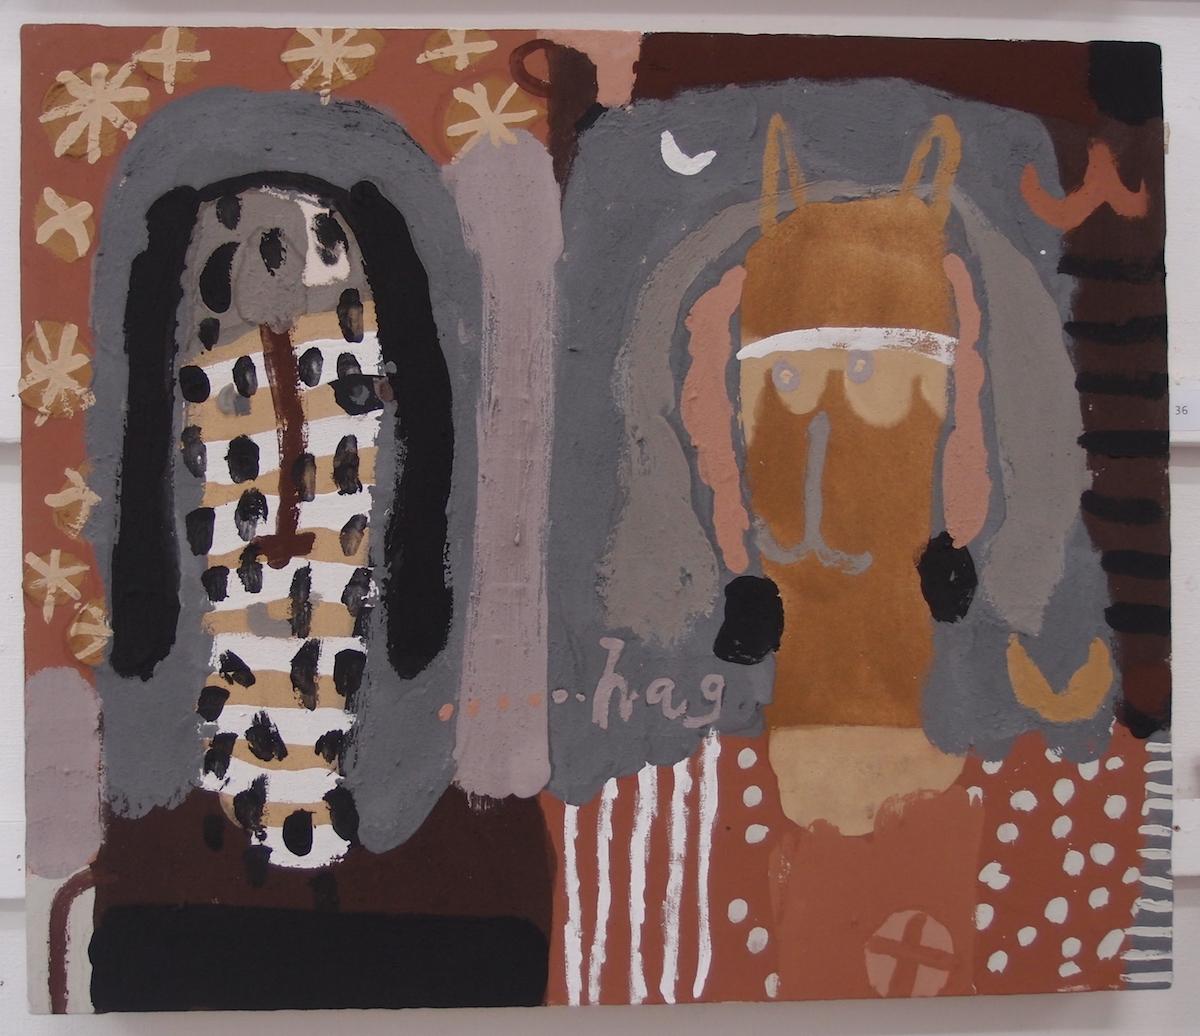 ki hag kathes hag ki / dog and cat and dog (Cornish earth pigments on canvas; 75x64cm) © p ward 2019